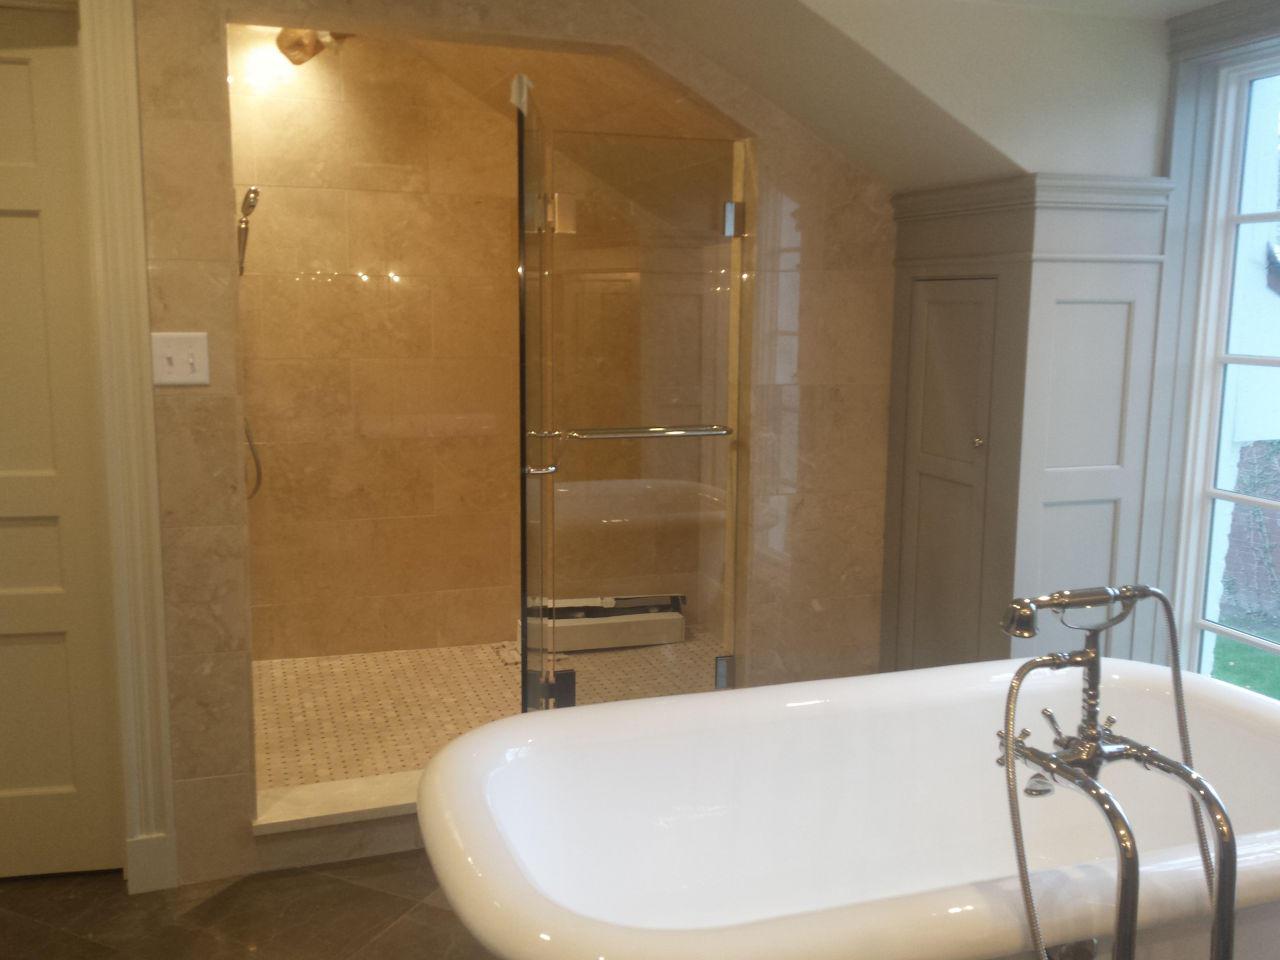 Remodeled Bathroom And Refinished Bathtub